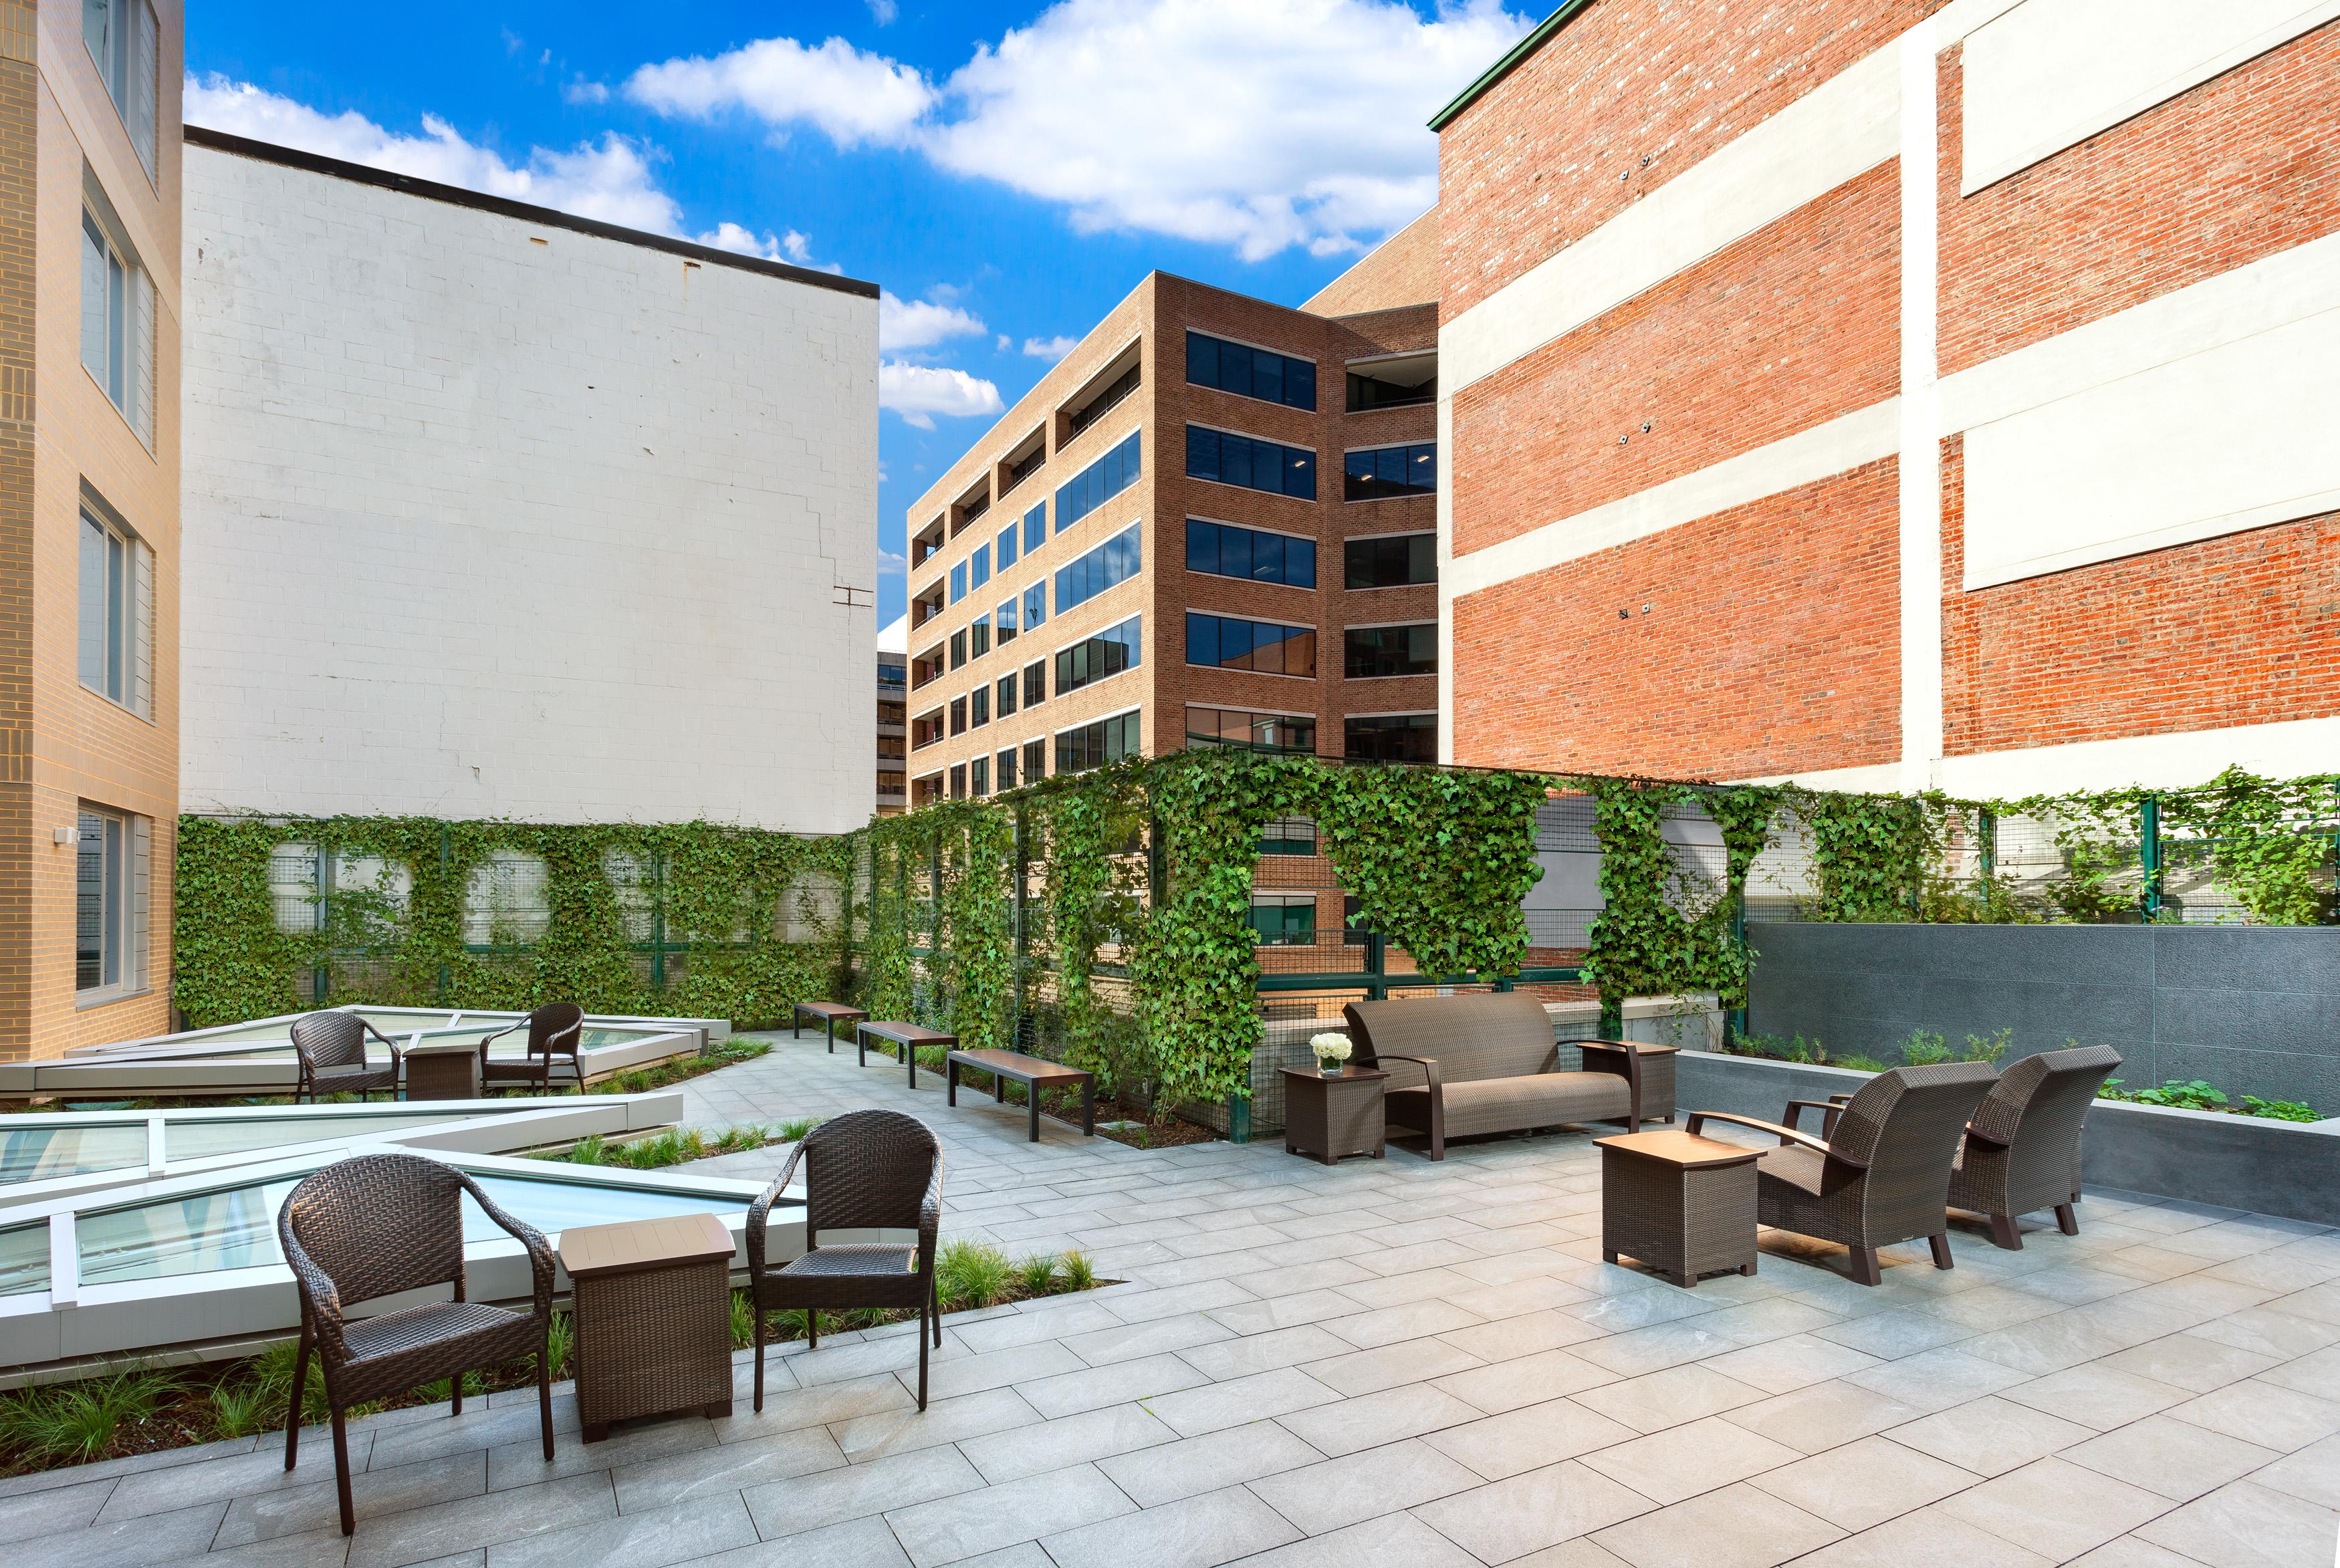 Hilton Garden Inn Washington Dc Georgetown Area In Washington Dc 20037